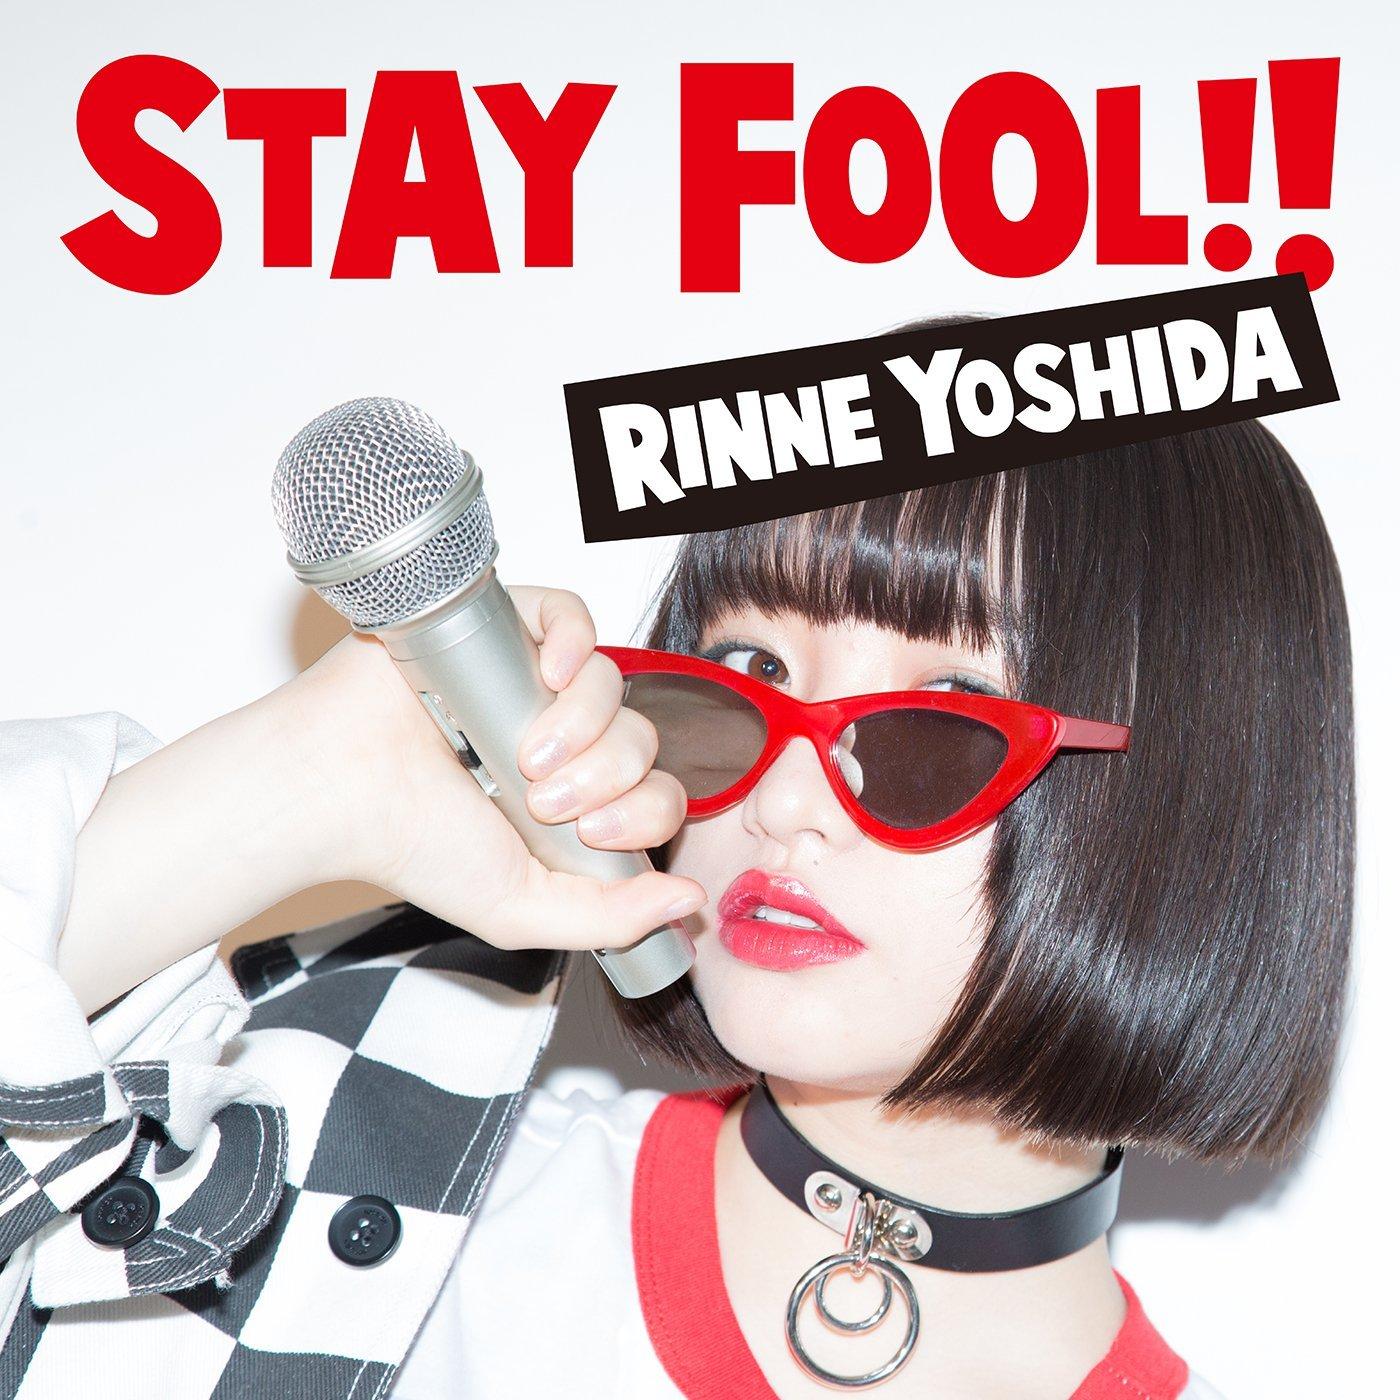 吉田凜音「STAY FOOL!!」